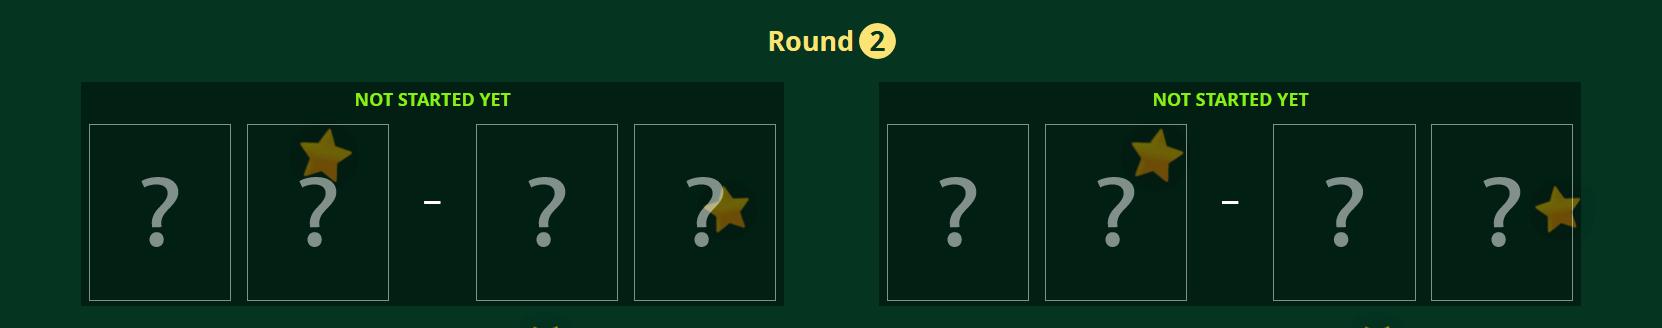 Tournament Round 2